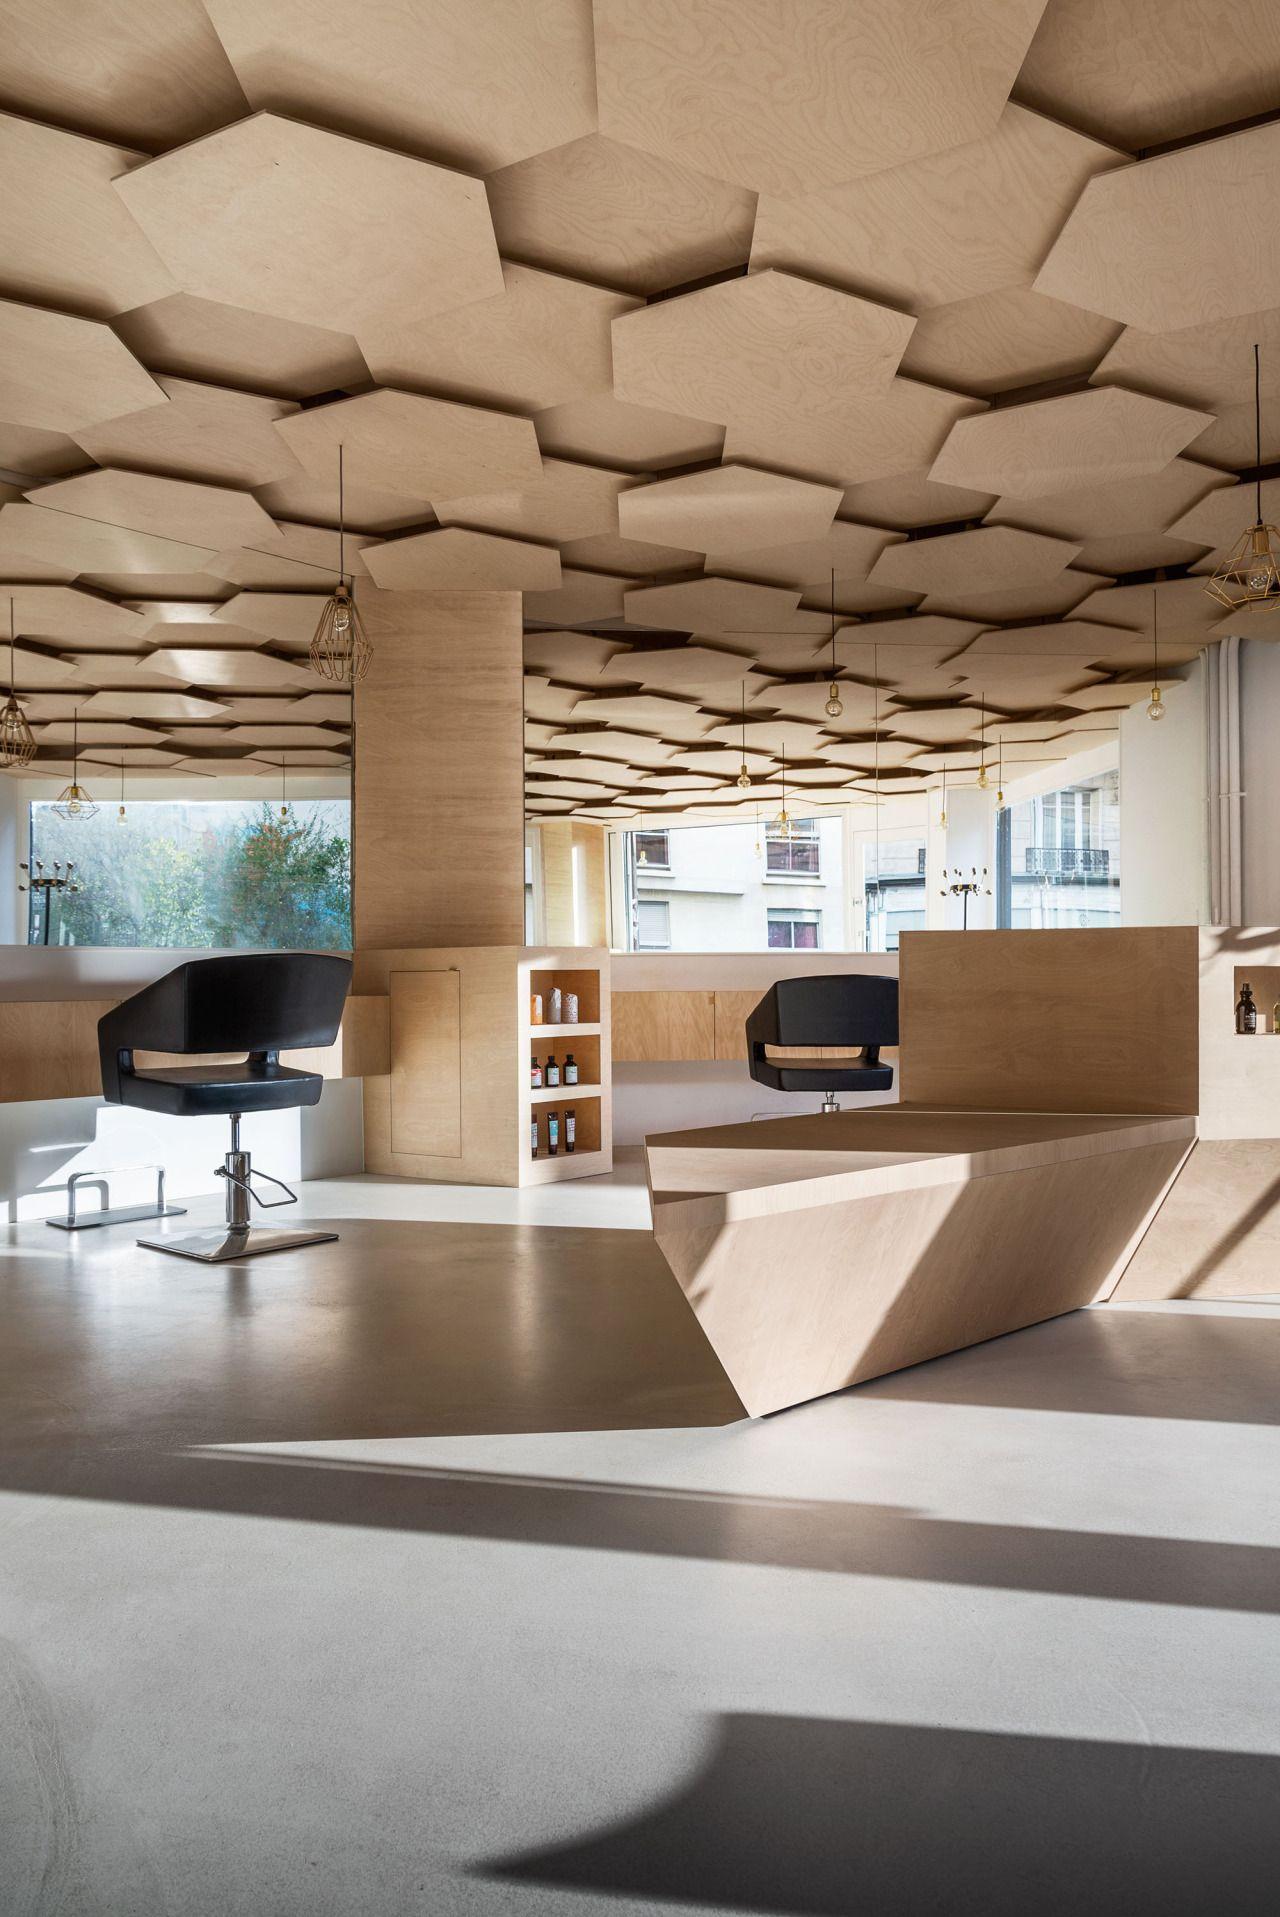 dezeen  Hexagonalpatterned ceiling added to Paris hair